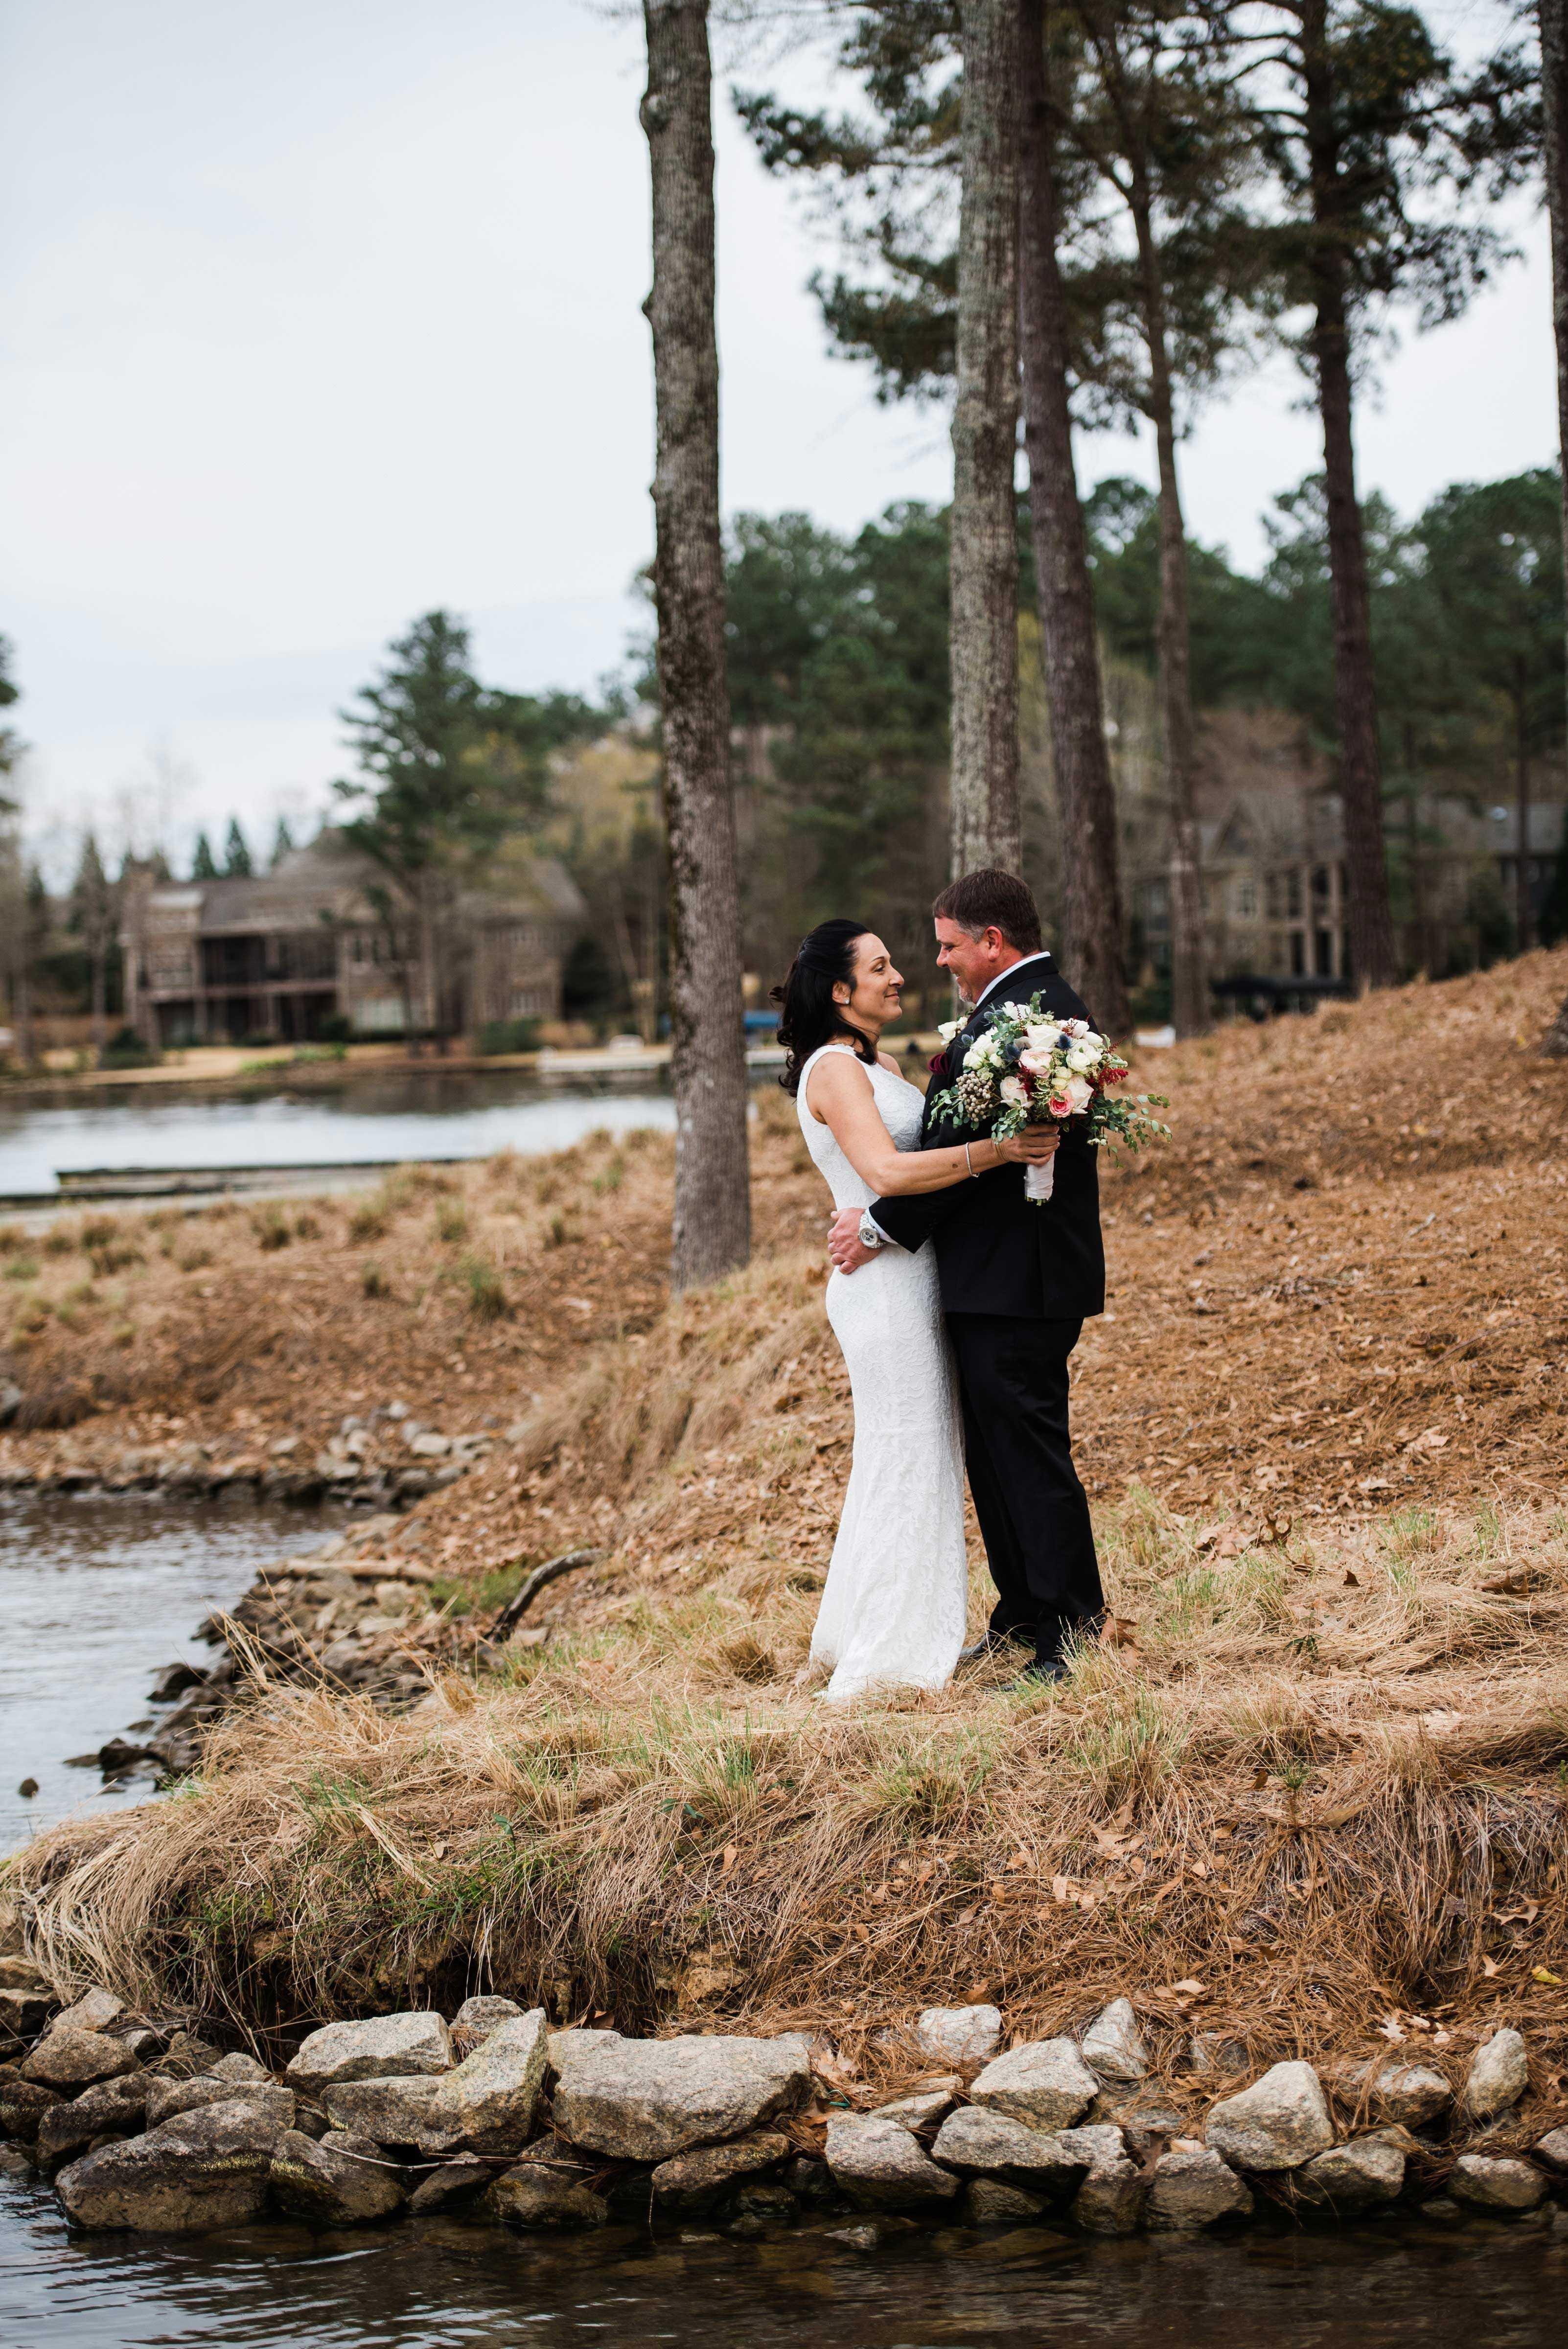 Cathy Bryant Wedding Resized 2